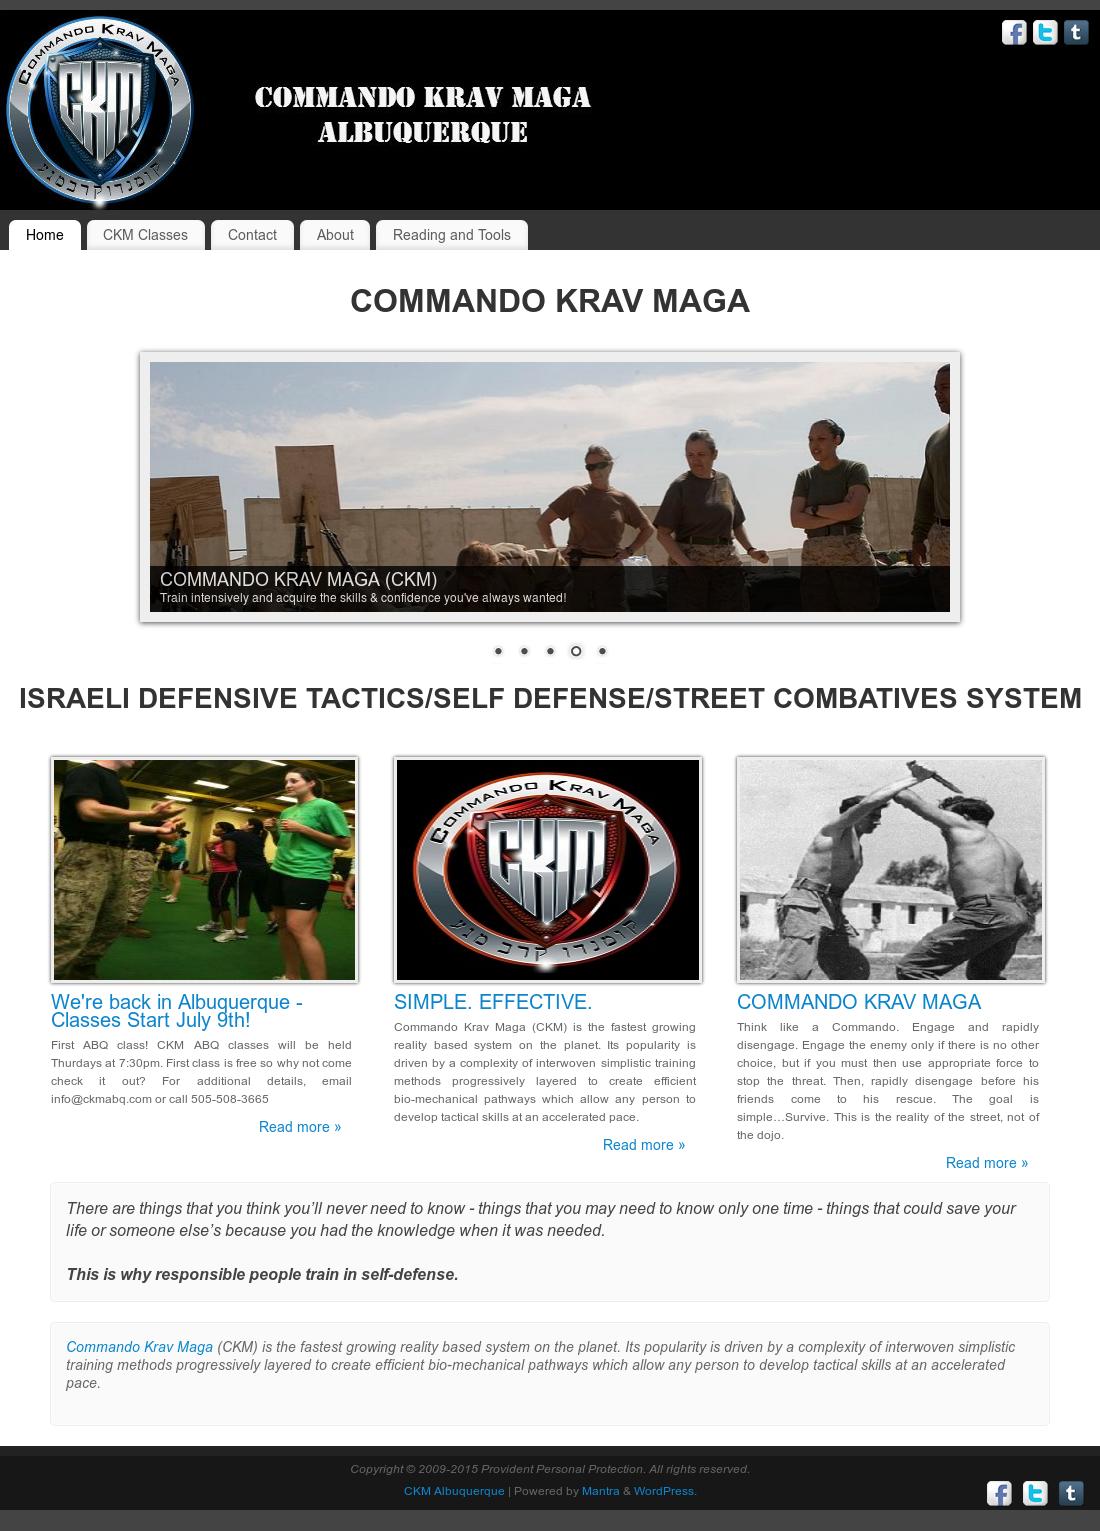 Commando Krav Maga Santa Fe Competitors, Revenue and